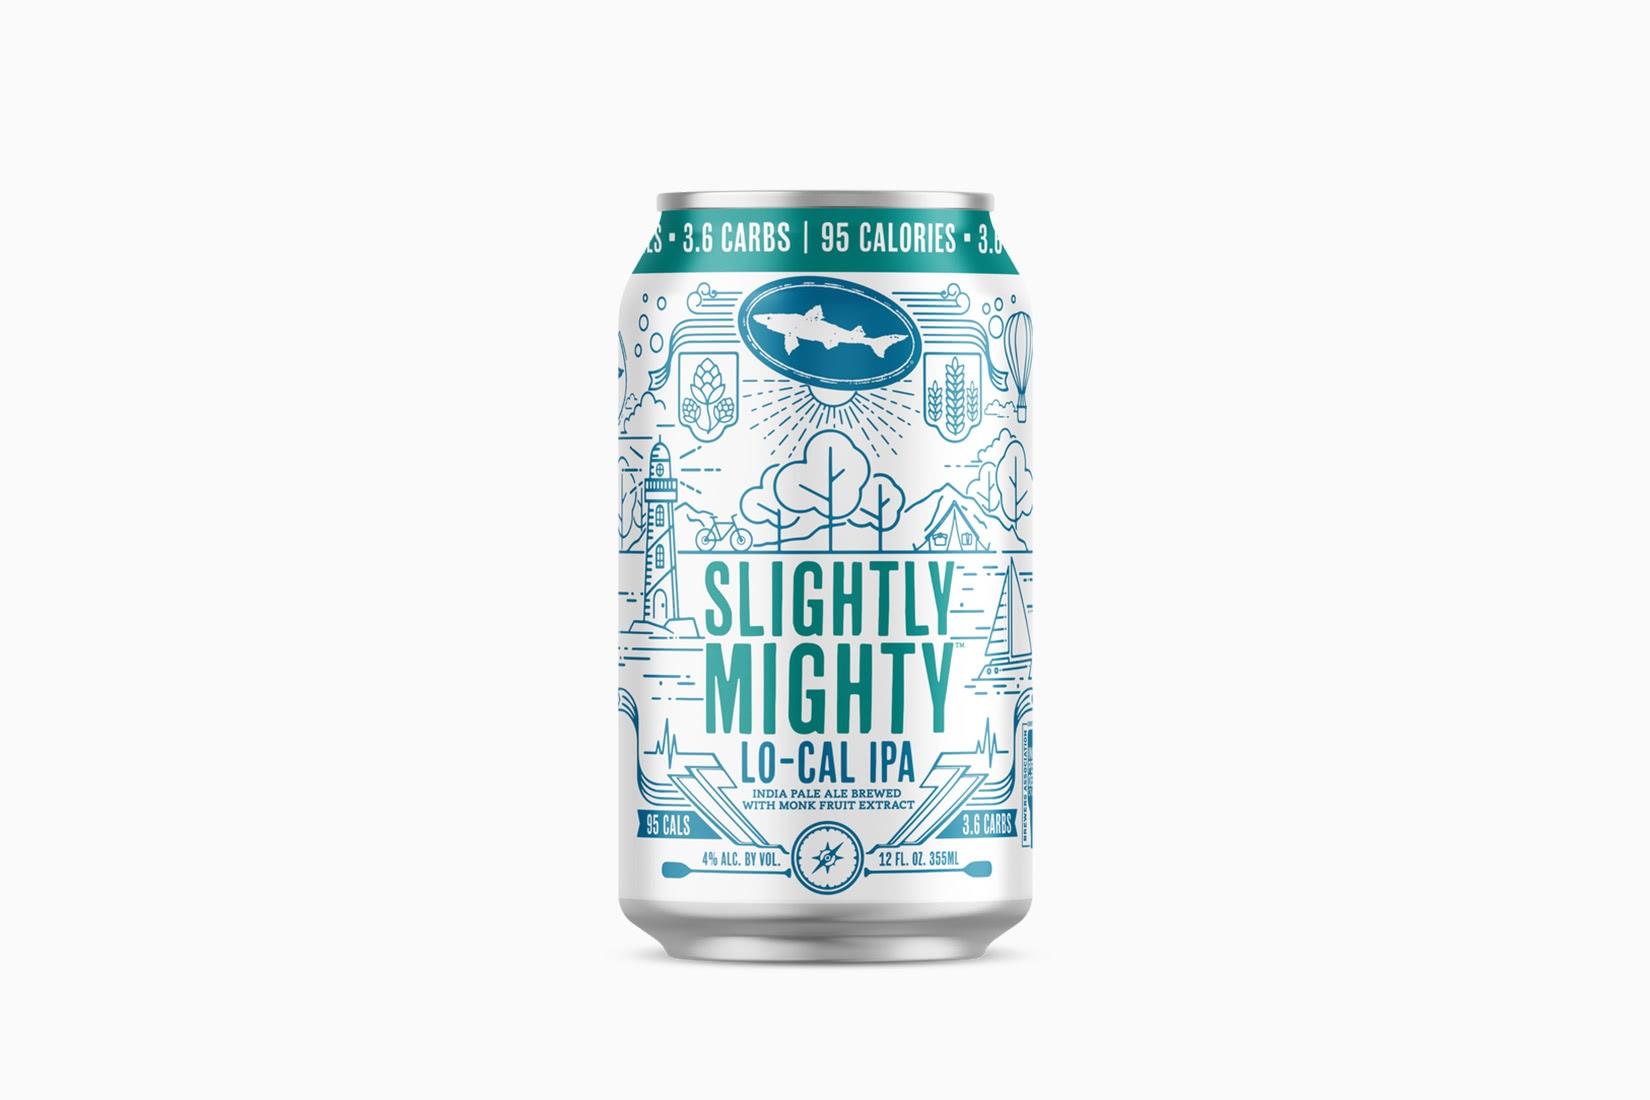 best beer brands dogfish head slightly mighty - Luxe Digital